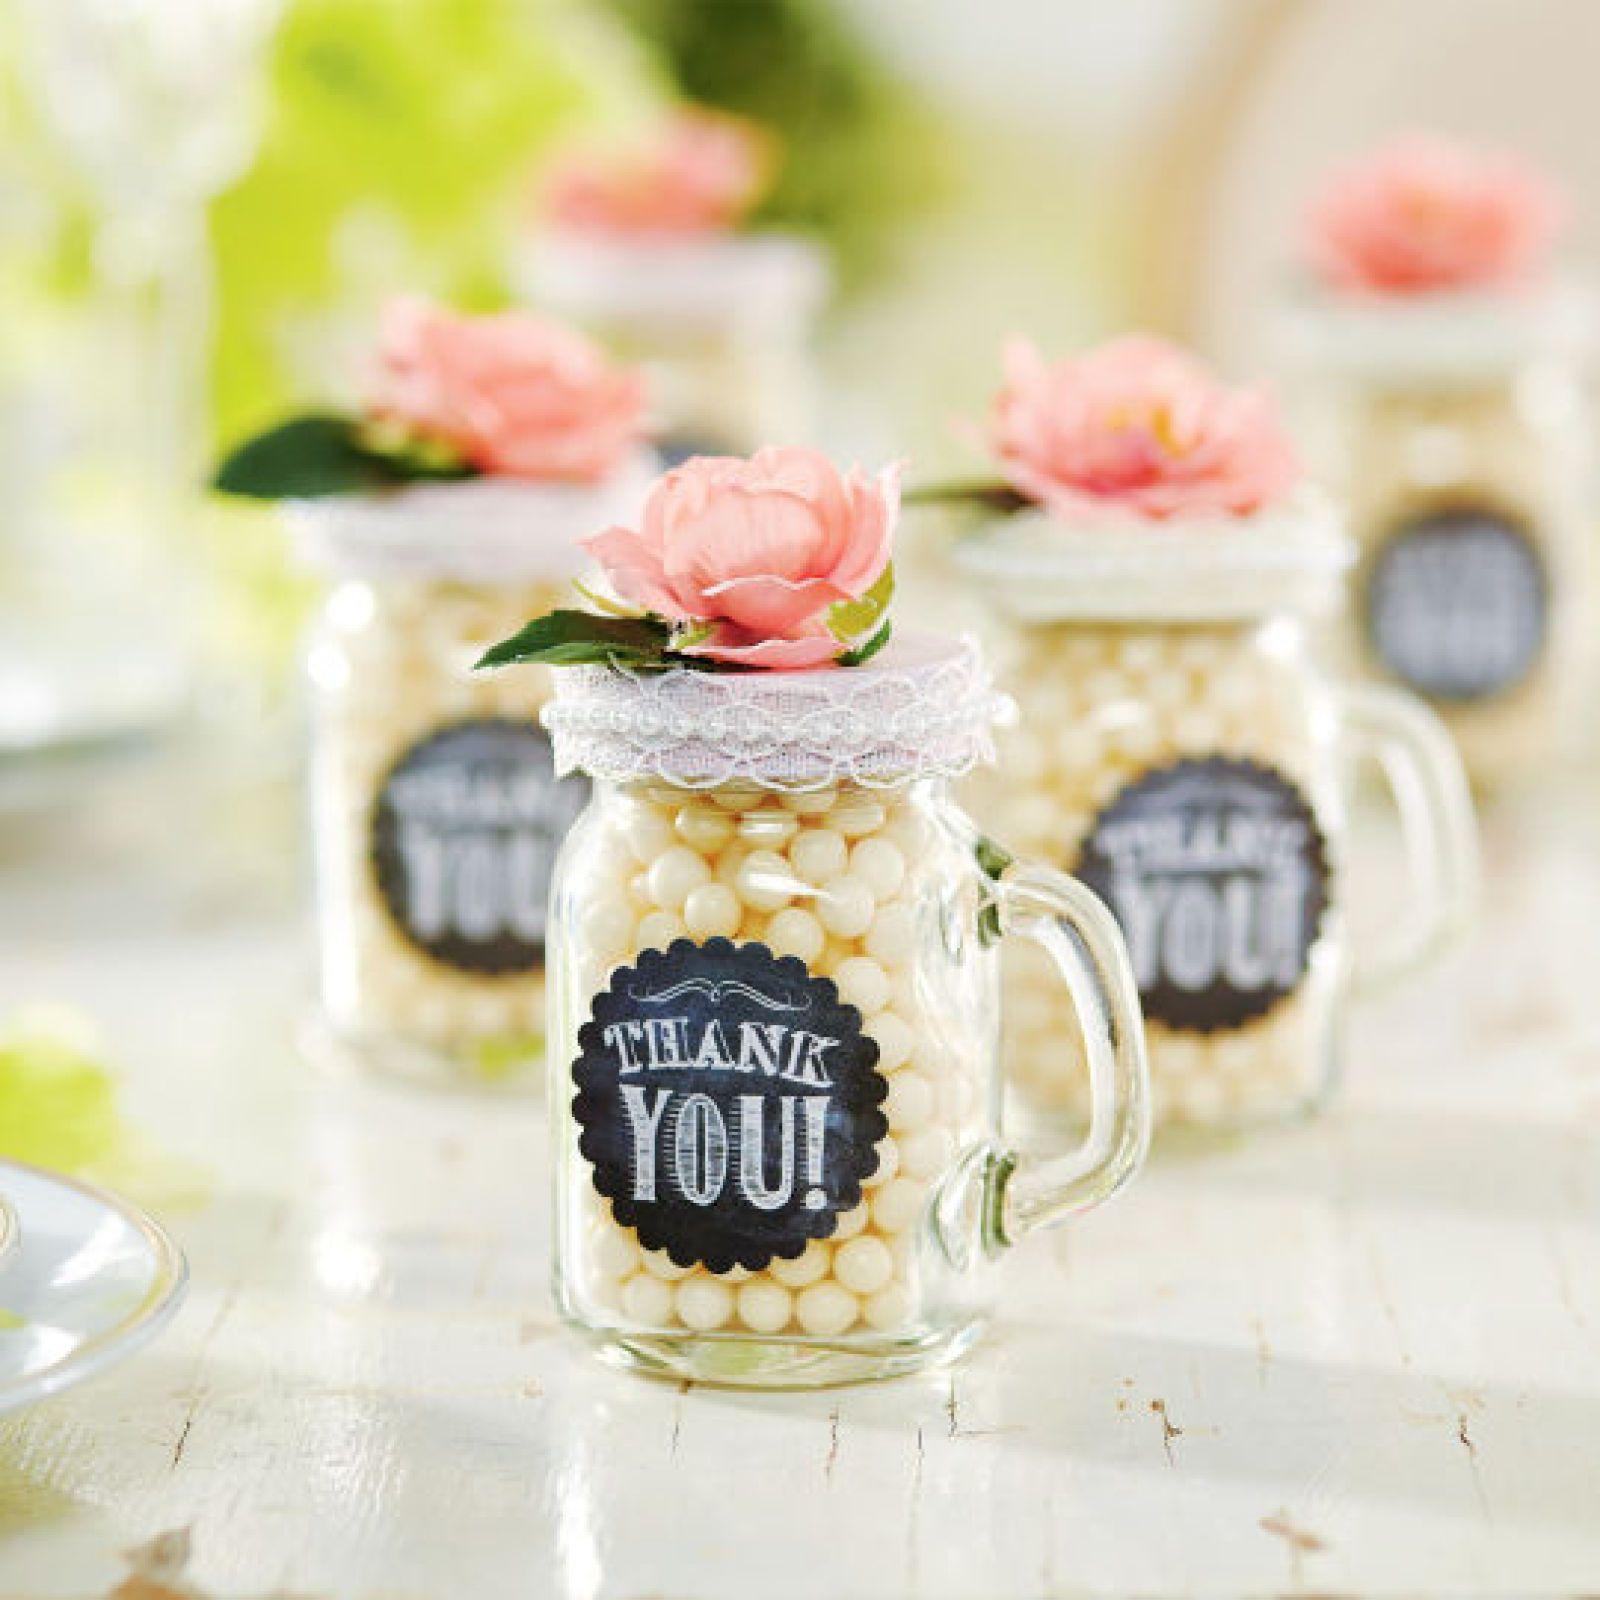 Coffee mug wedding favors - Mini Mason Jar Mug Favors Perfect For Holiday Gifts